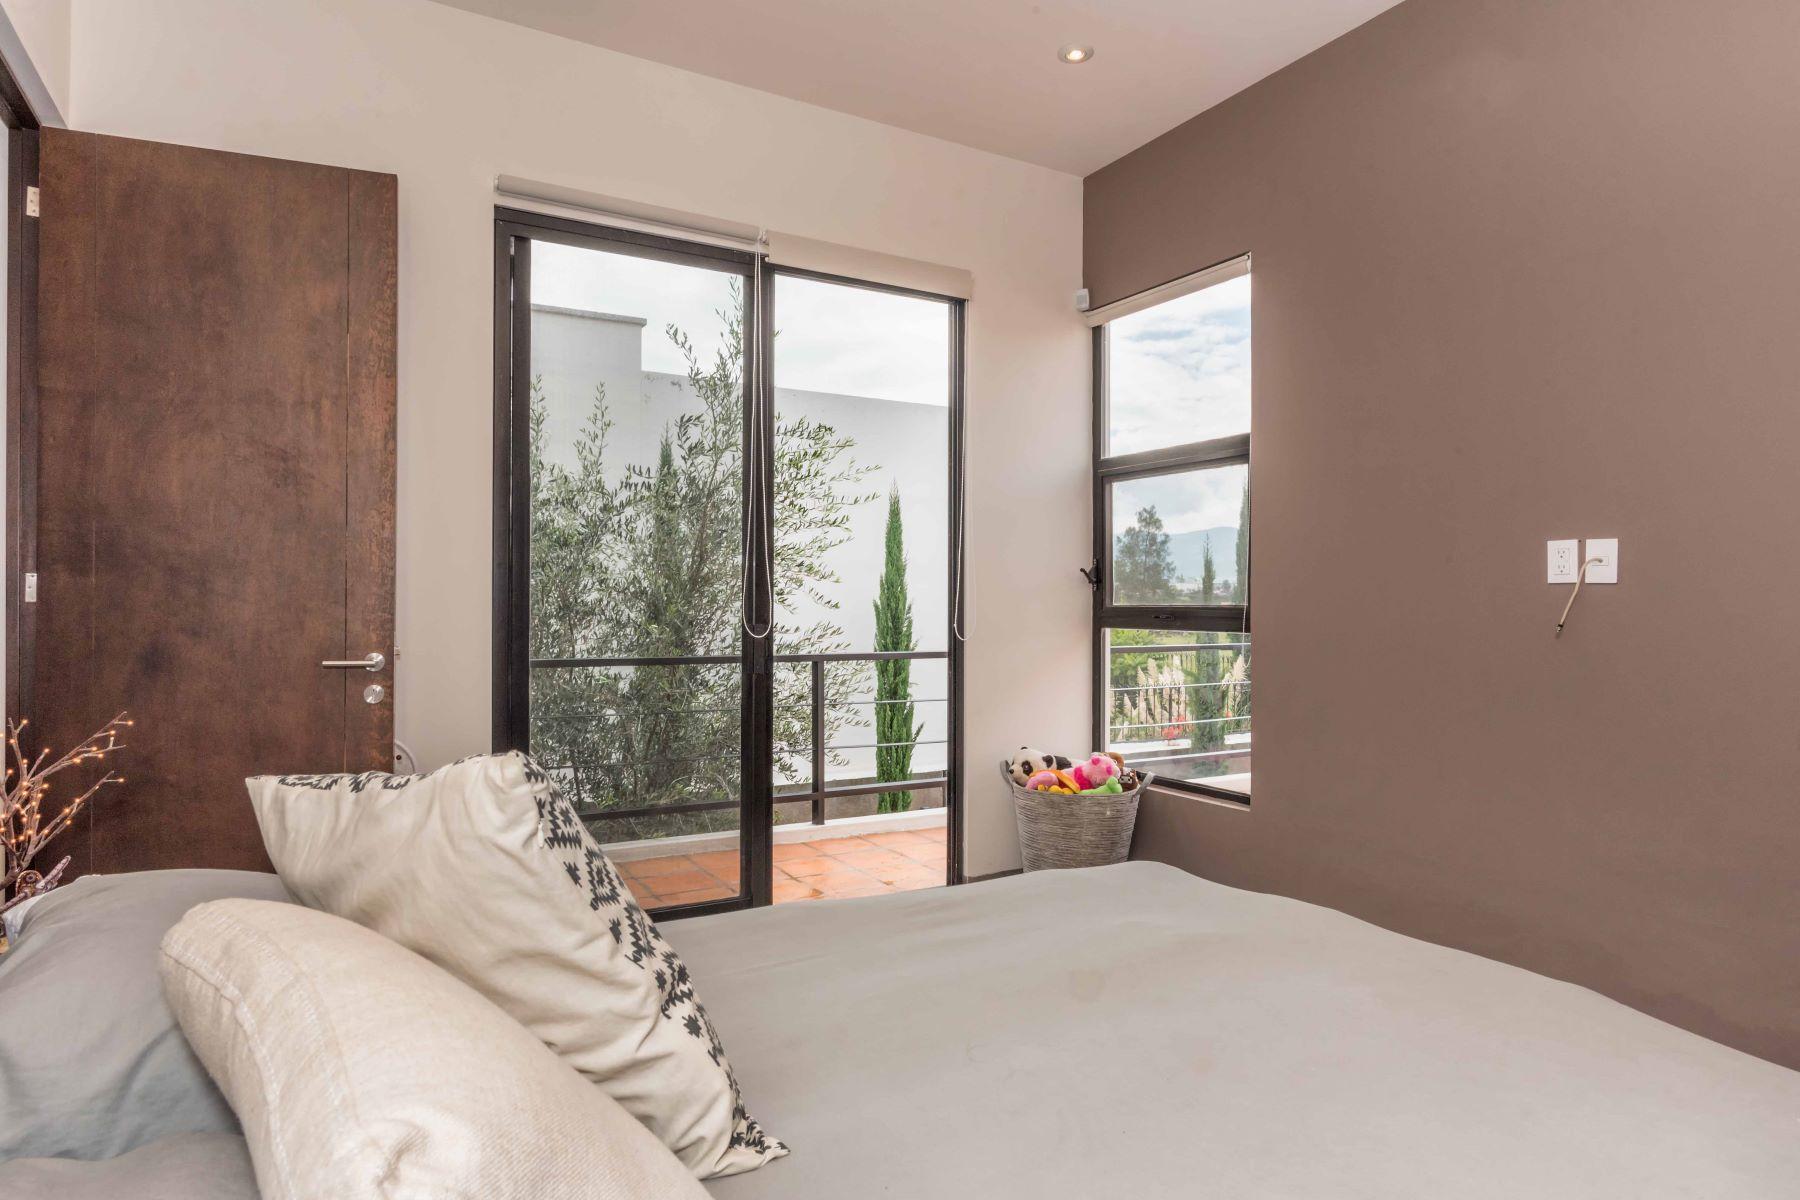 Additional photo for property listing at CASA PIXIE Atascadero, San Miguel De Allende, Guanajuato Mexico